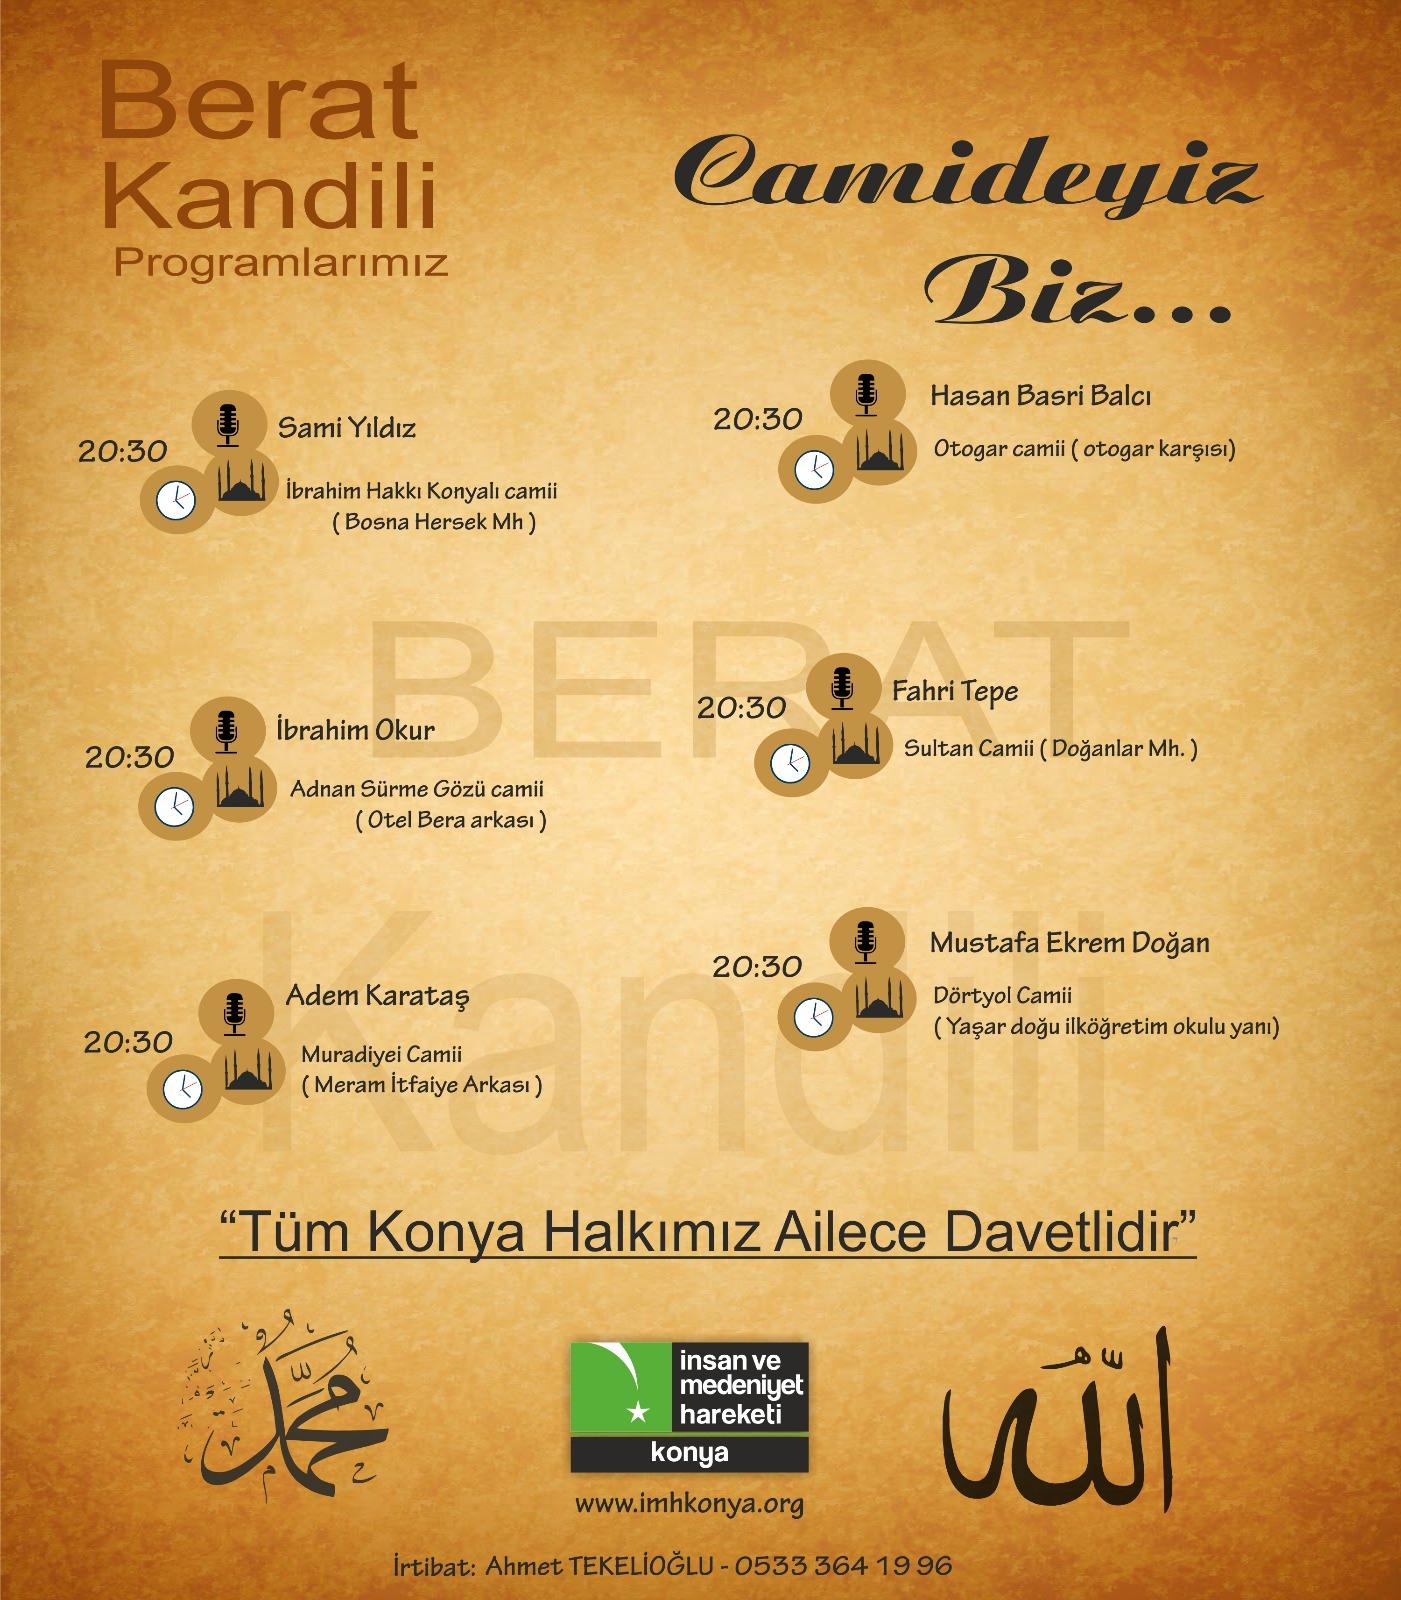 İMH Konya'dan Beraat Kandili Programları